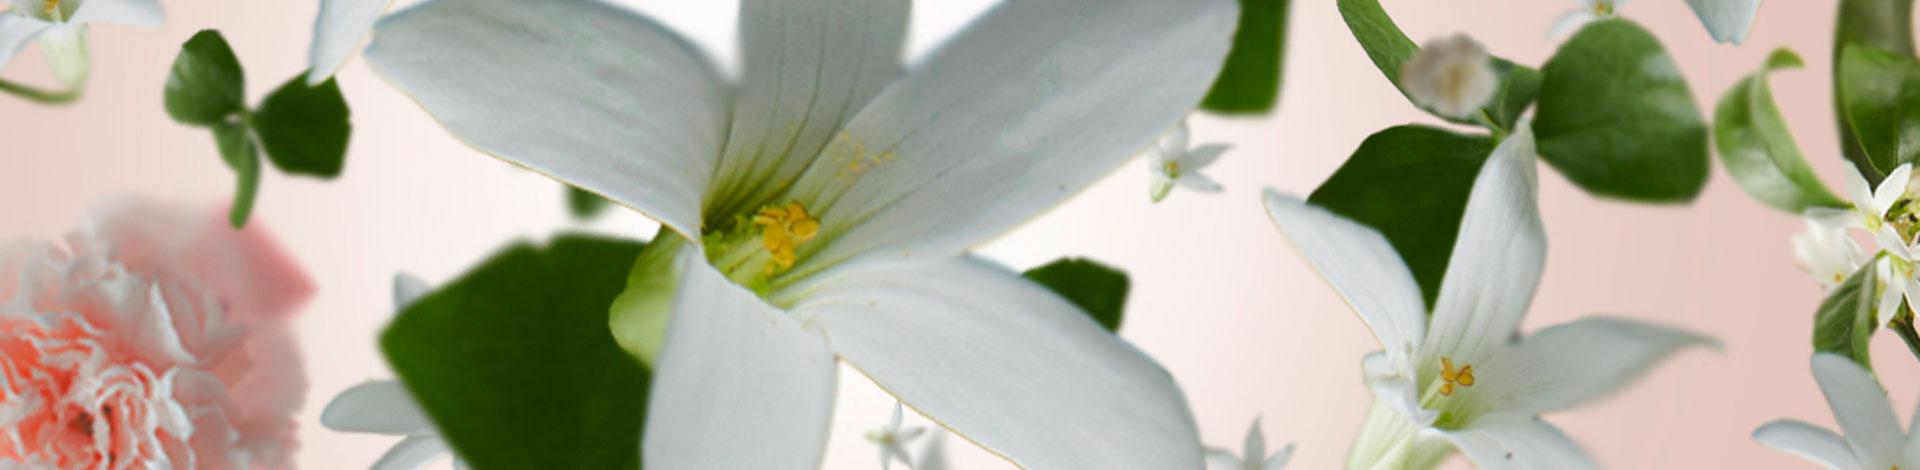 Flores de Jazmín aroma floral